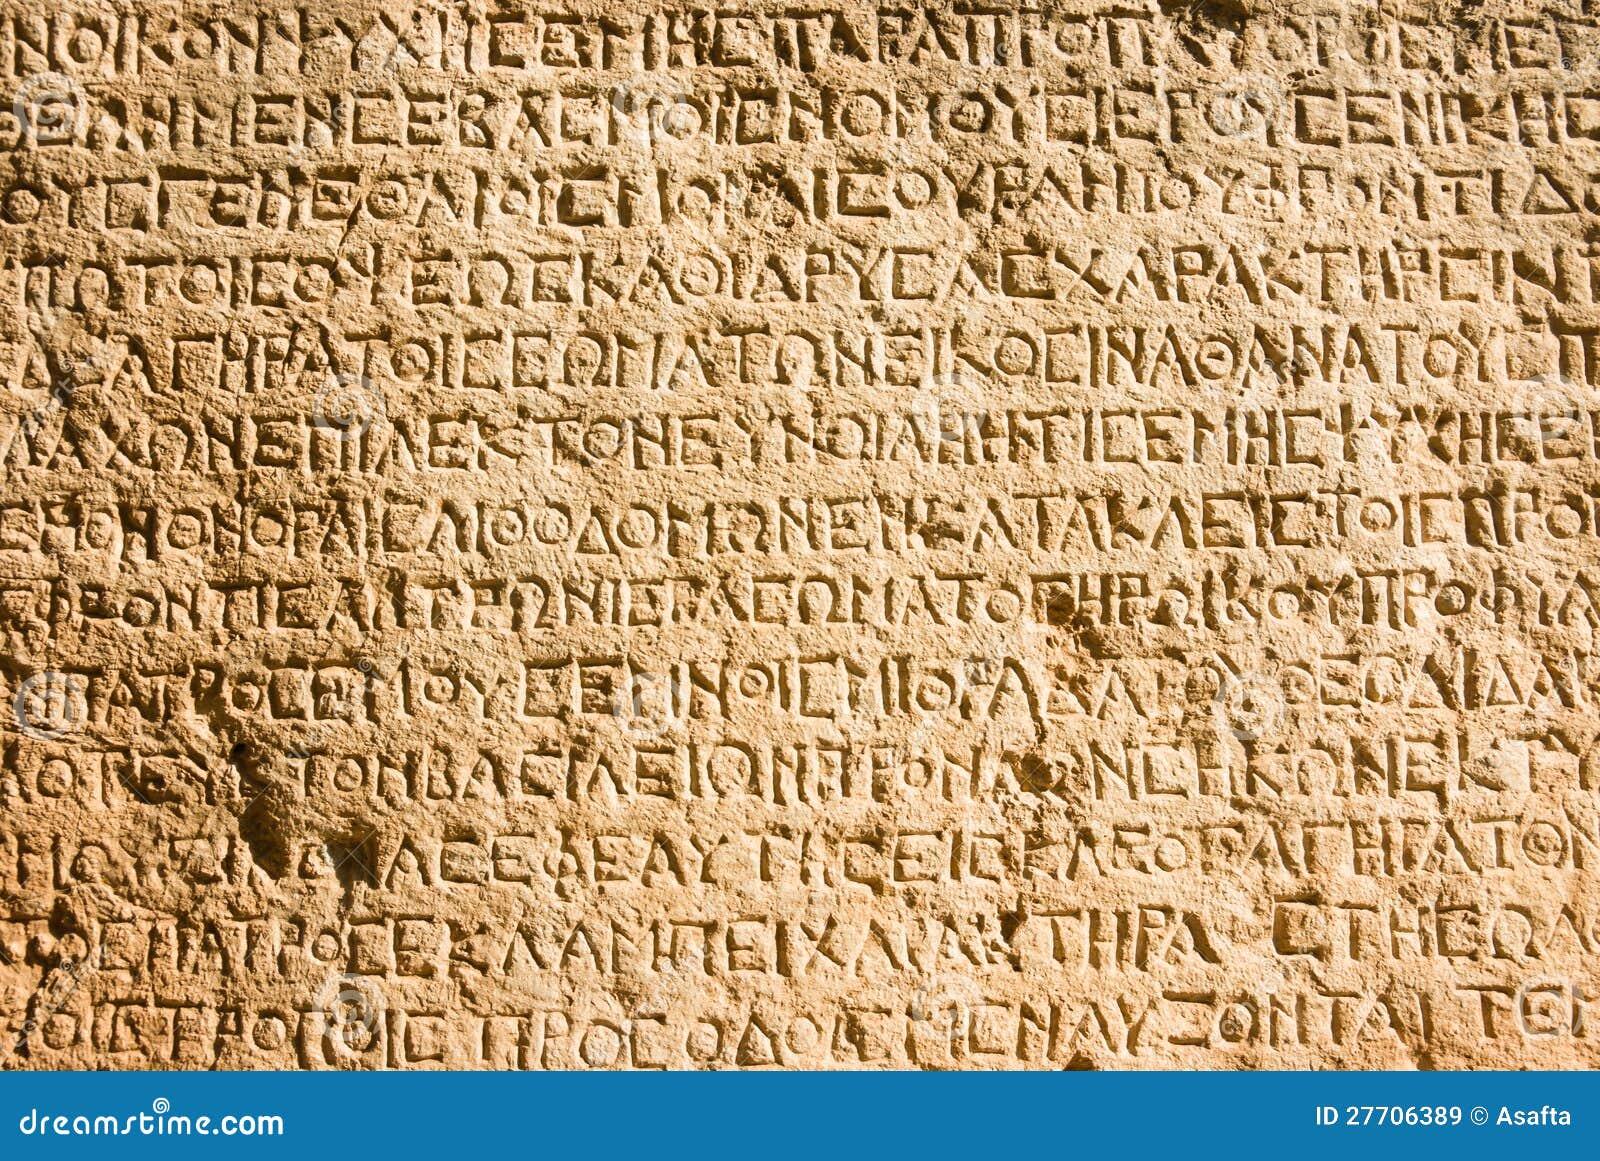 free Archeologia: teorie, metody, praktyka